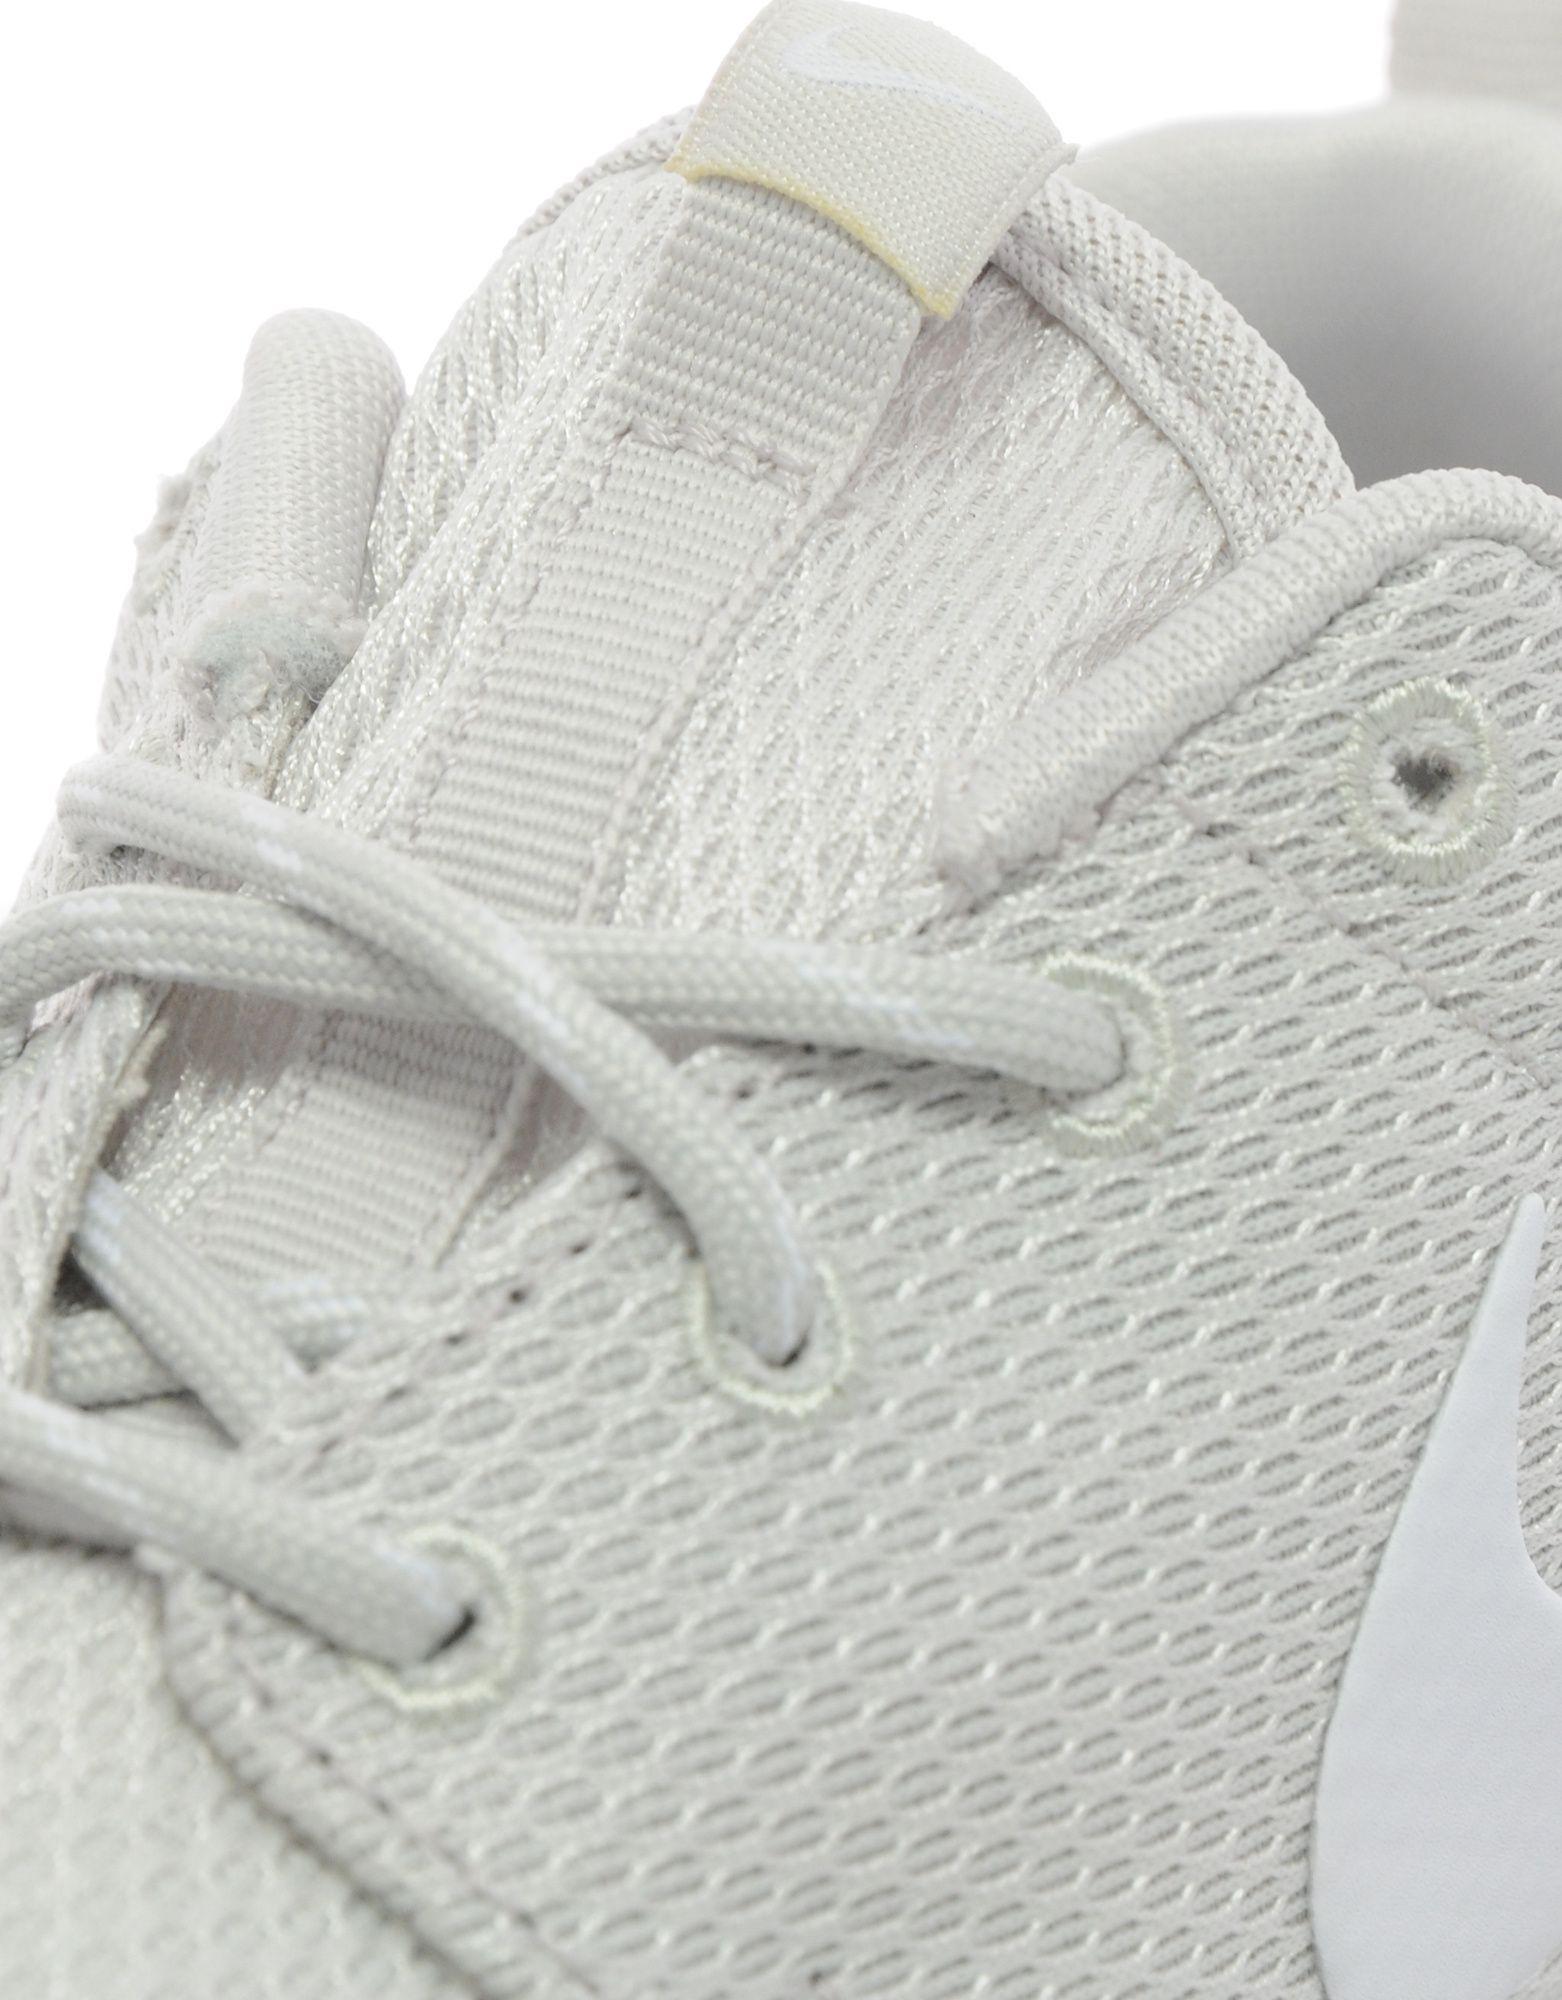 ikrfe Nike Roshe One Women\'s | JD Sports